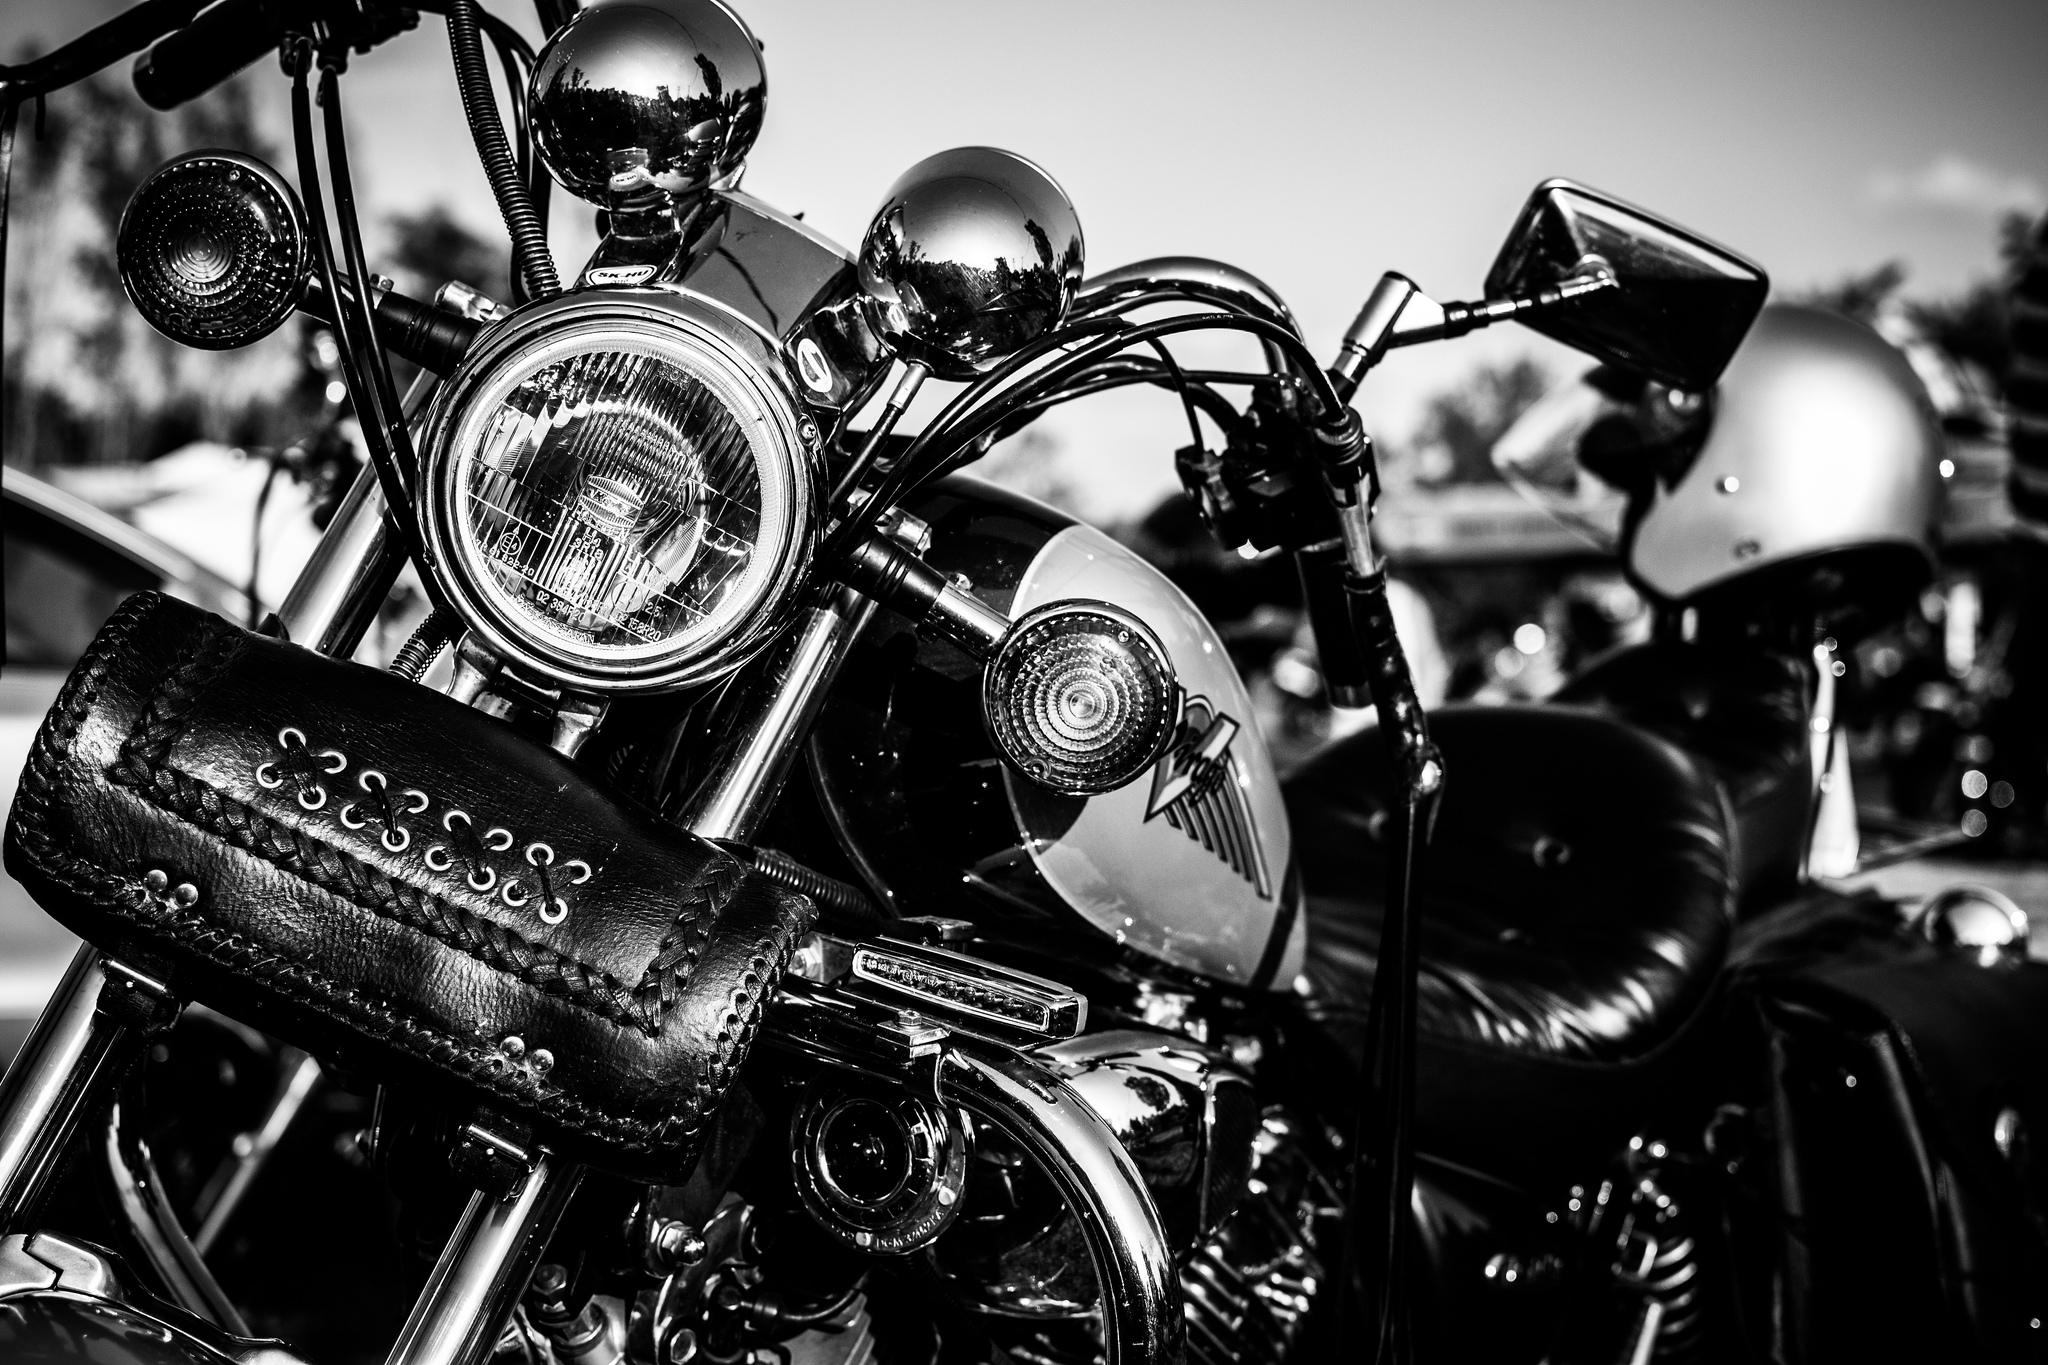 Harley Davidson HD Wallpaper Free download | PixelsTalk Net